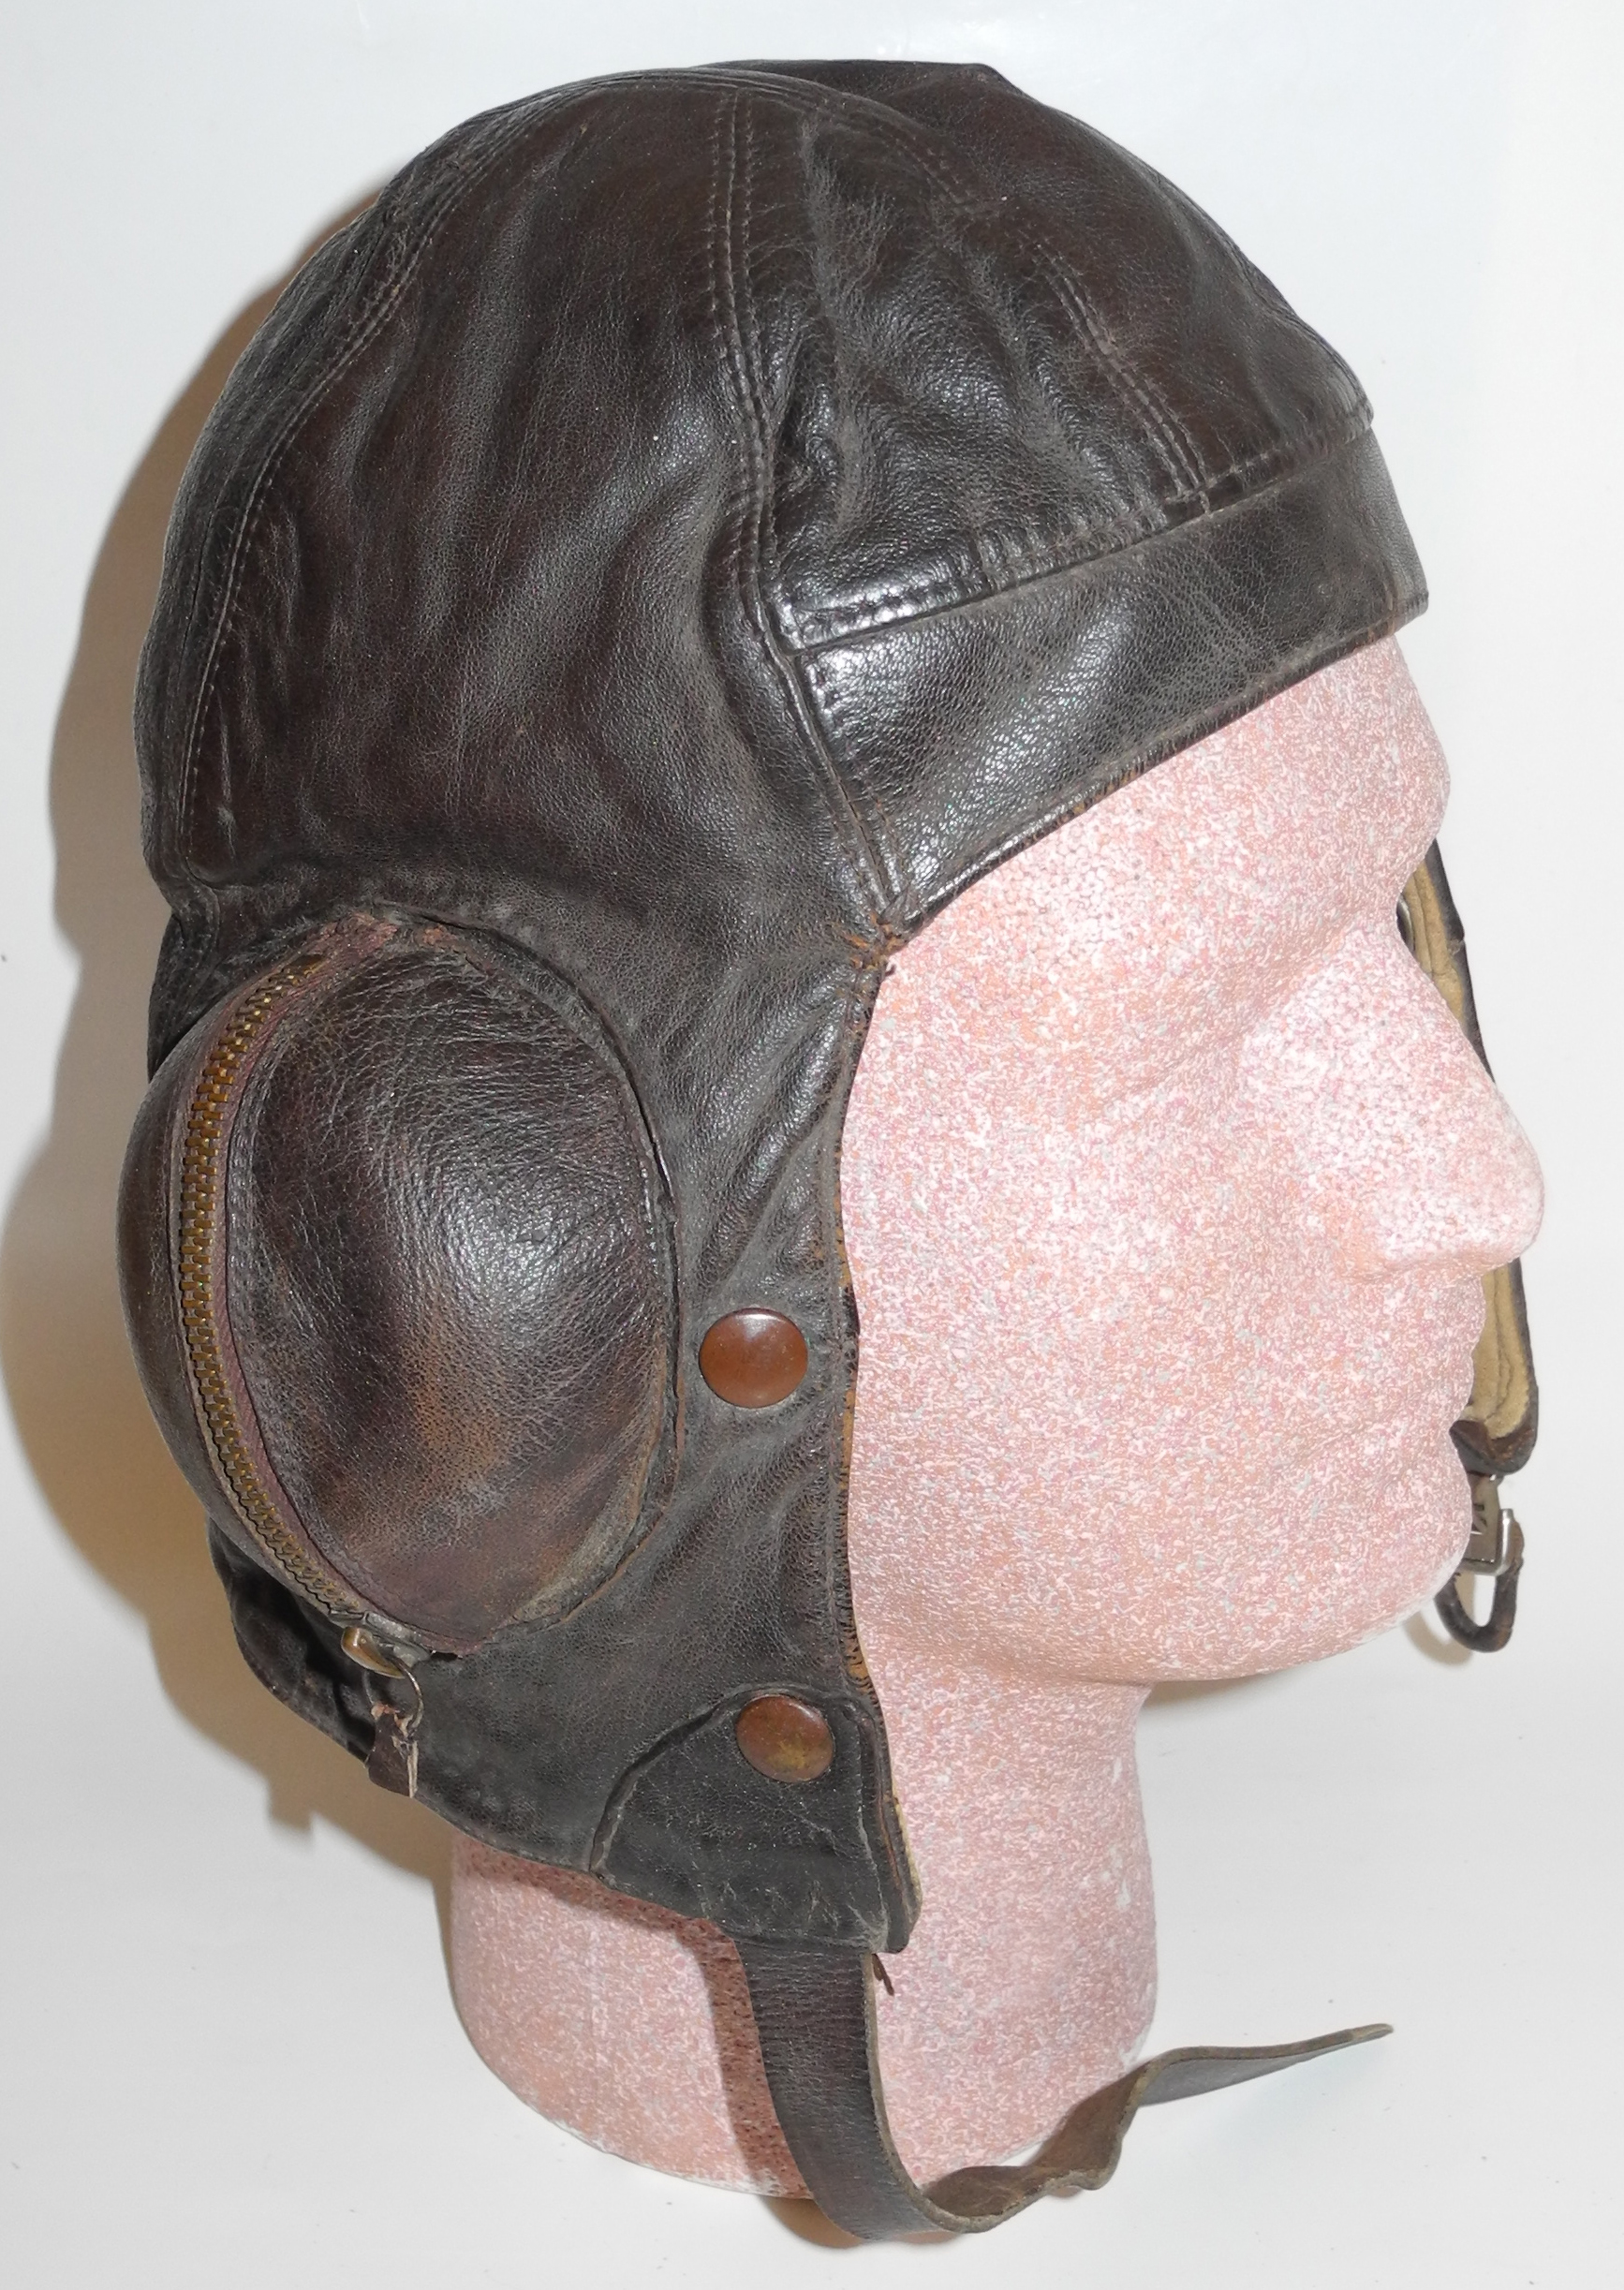 Early unlabeled Type B helmet